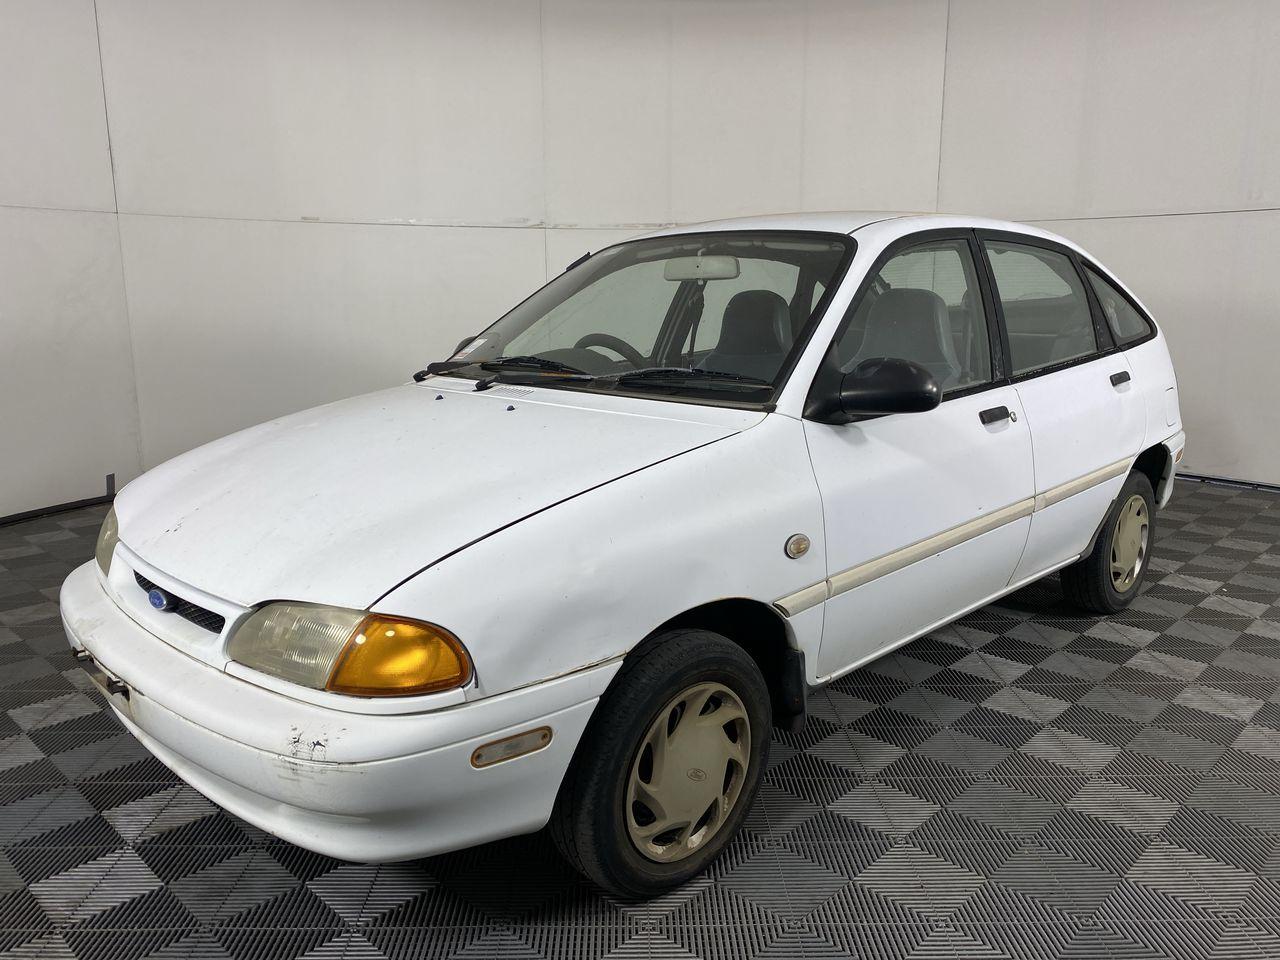 1995 Ford Festiva GLi Auto Hatchback, 120,469km